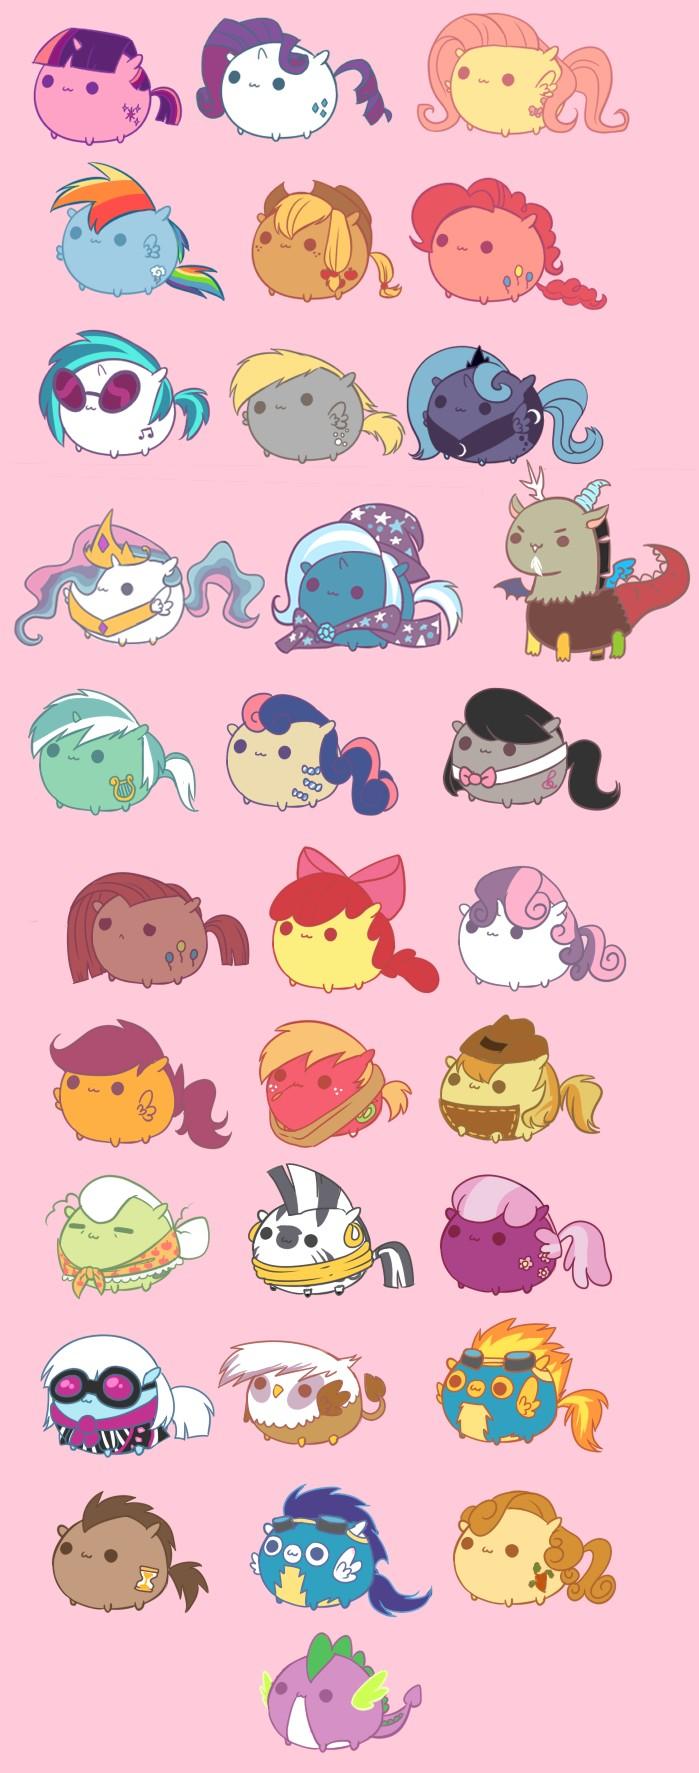 Drawn my little pony cat Little is friendship pony is